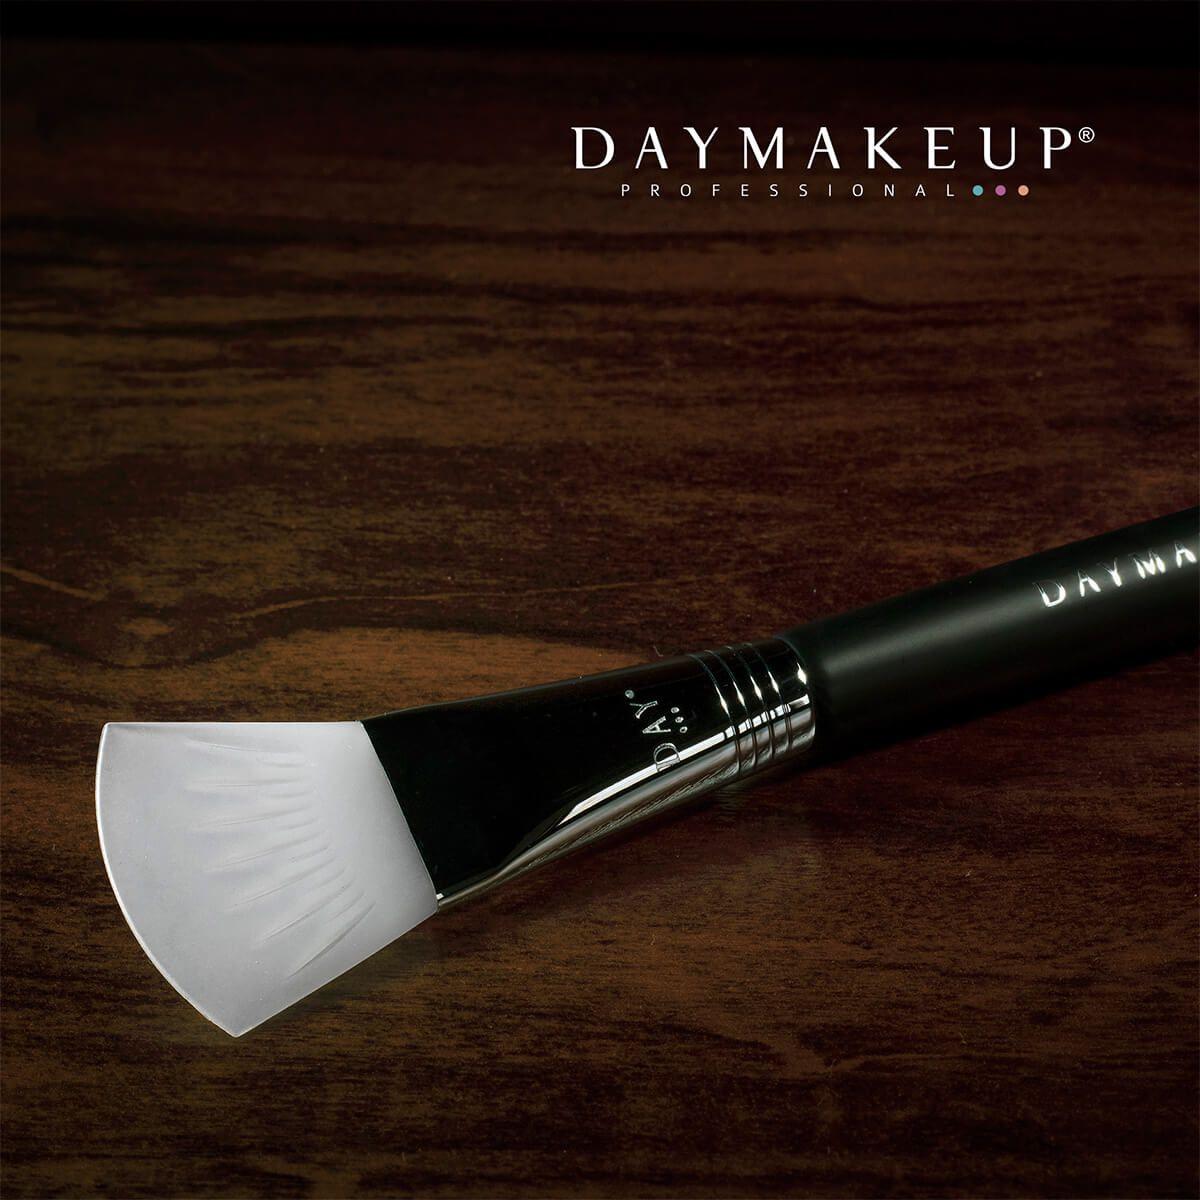 Pincel F280 para Pele em Silicone Daymakeup Skincare Silicon